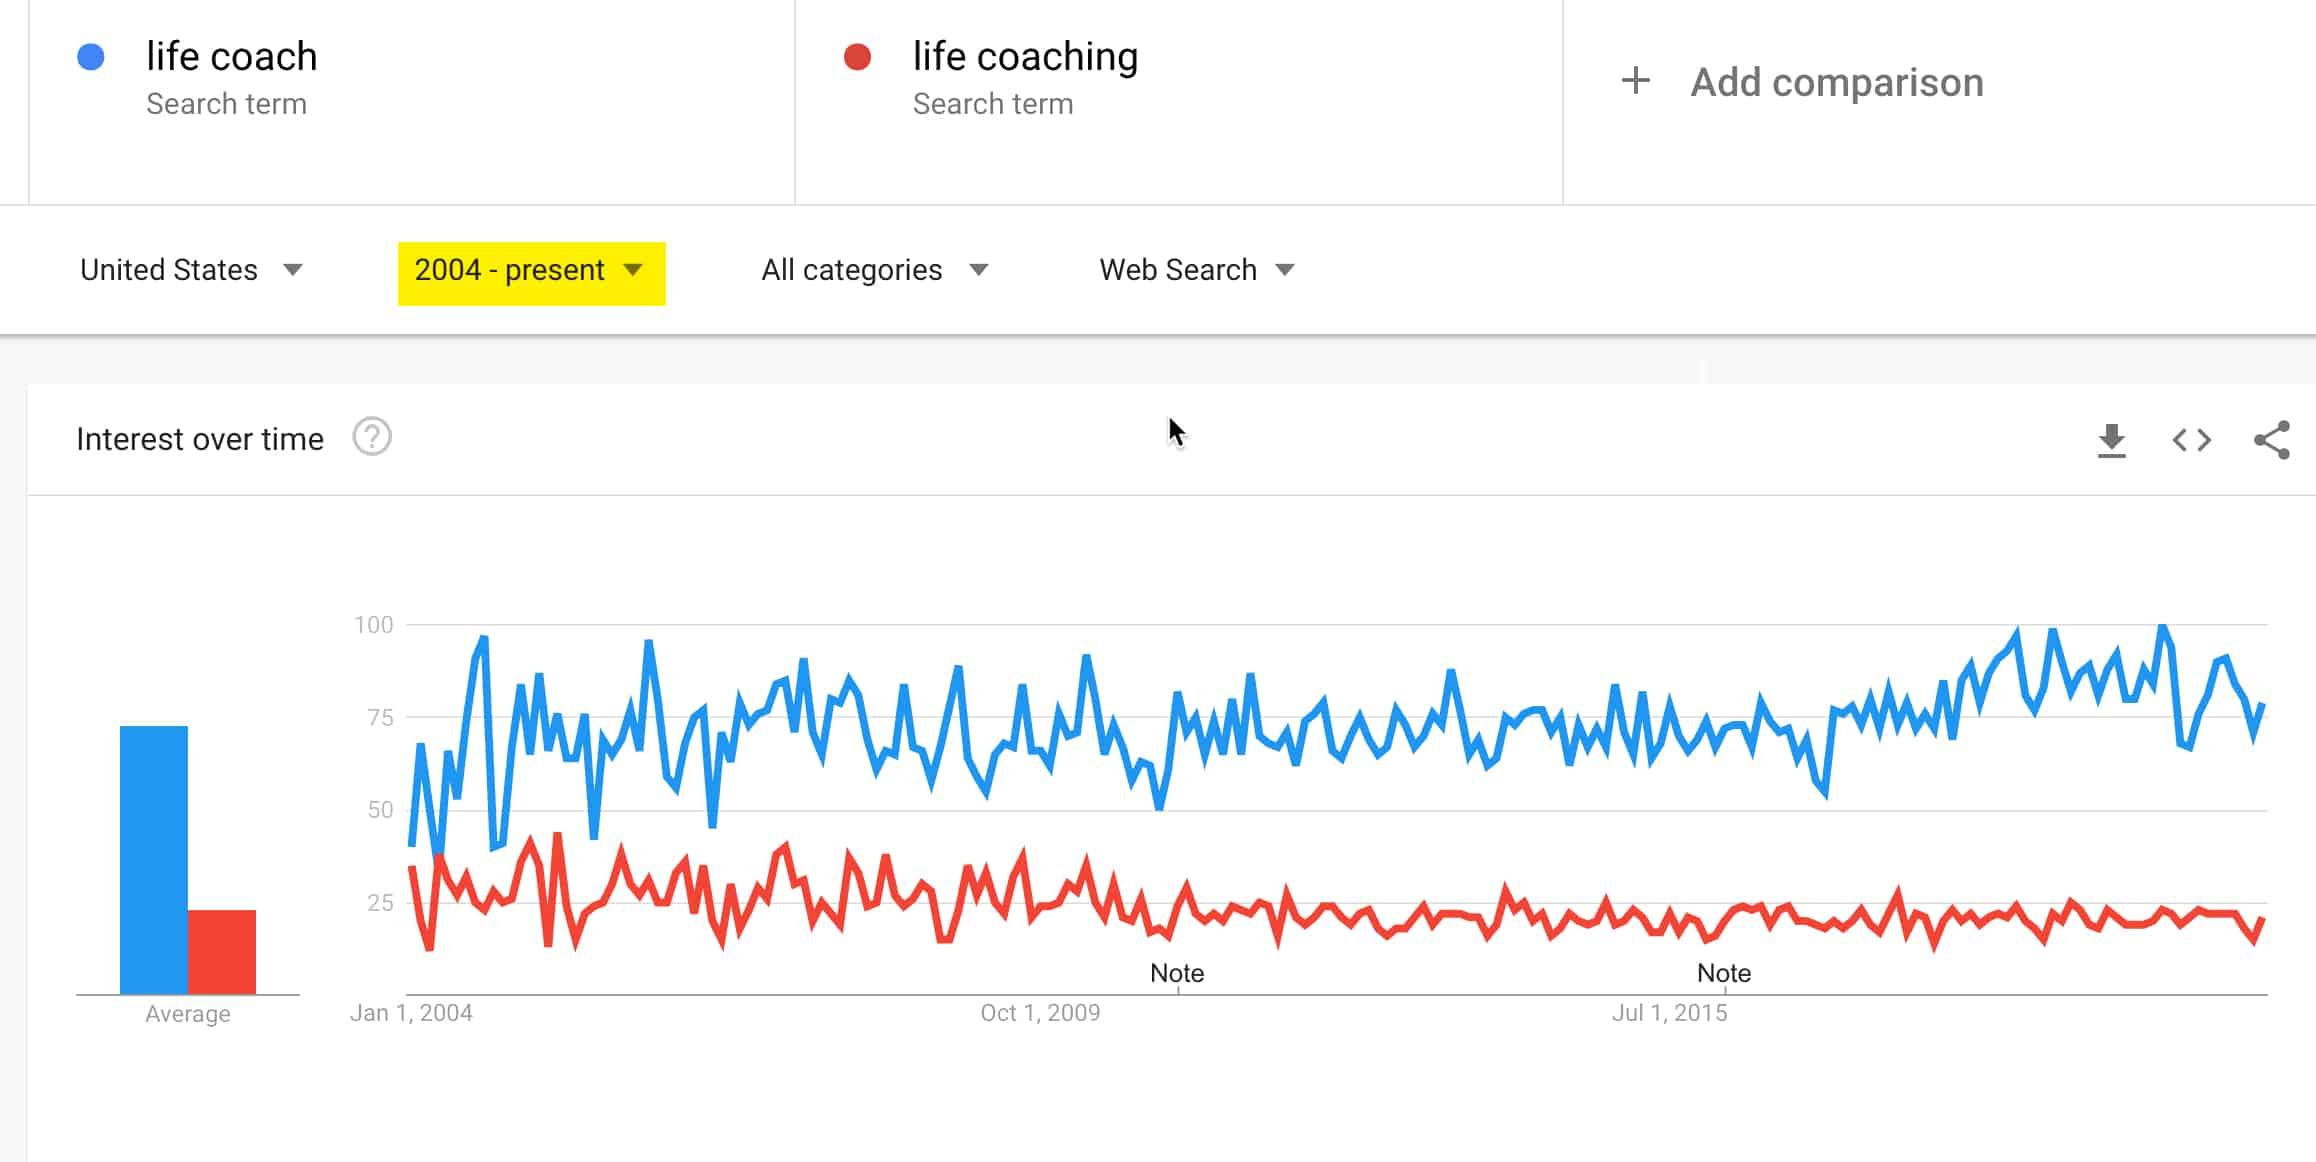 life coaching 2021 comparison